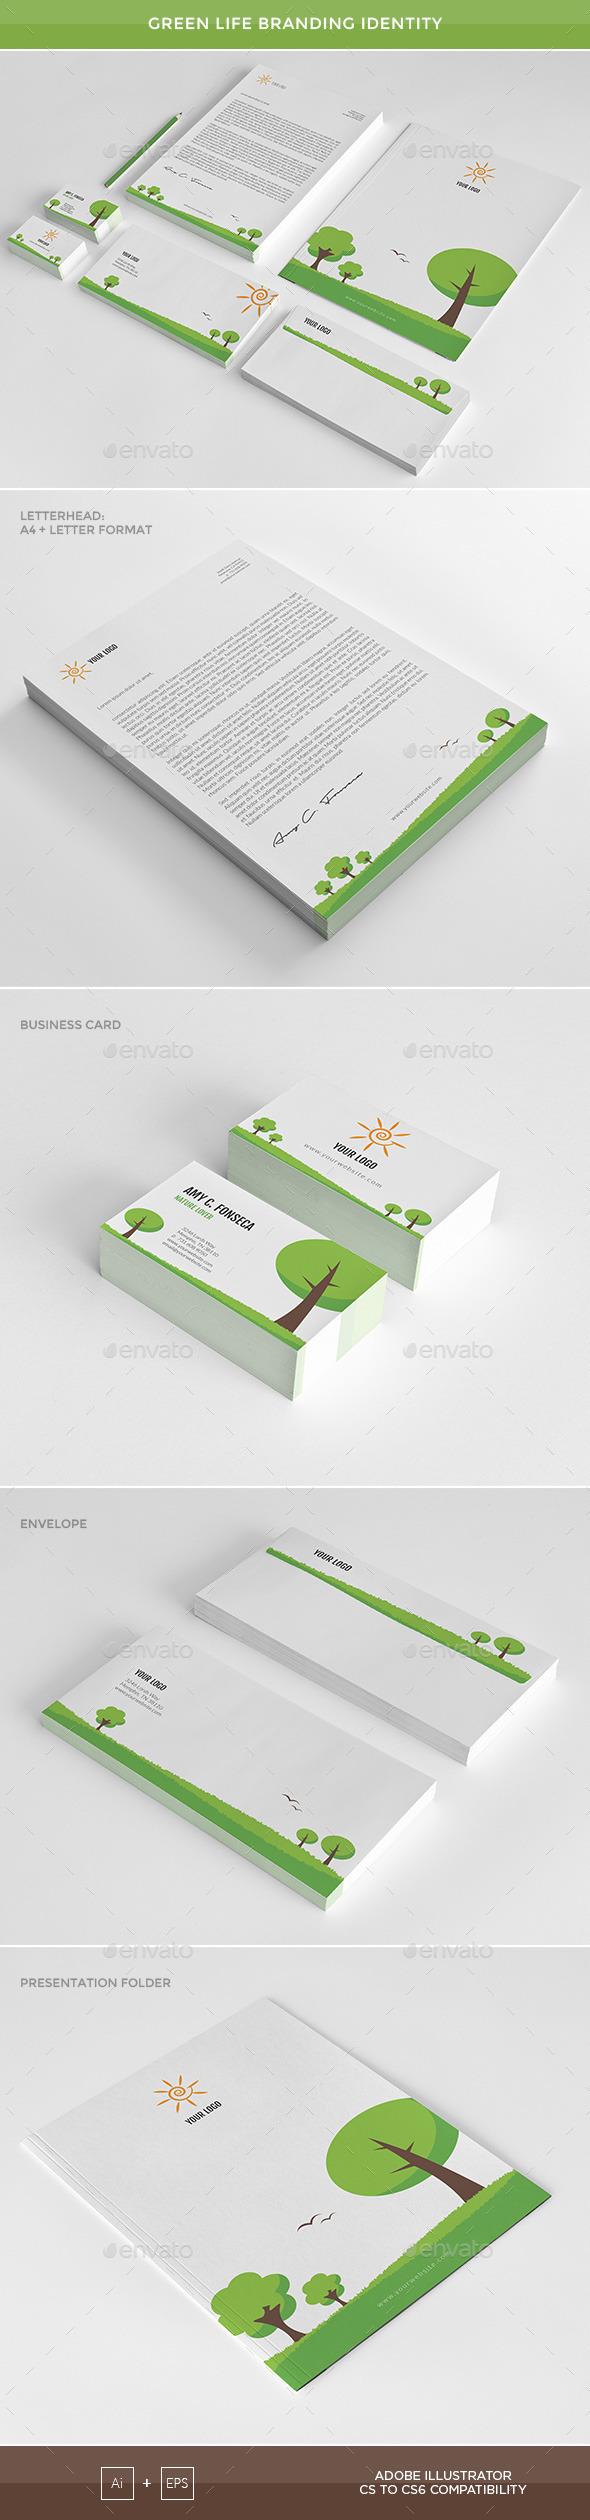 Green Life - Branding Identity - Stationery Print Templates